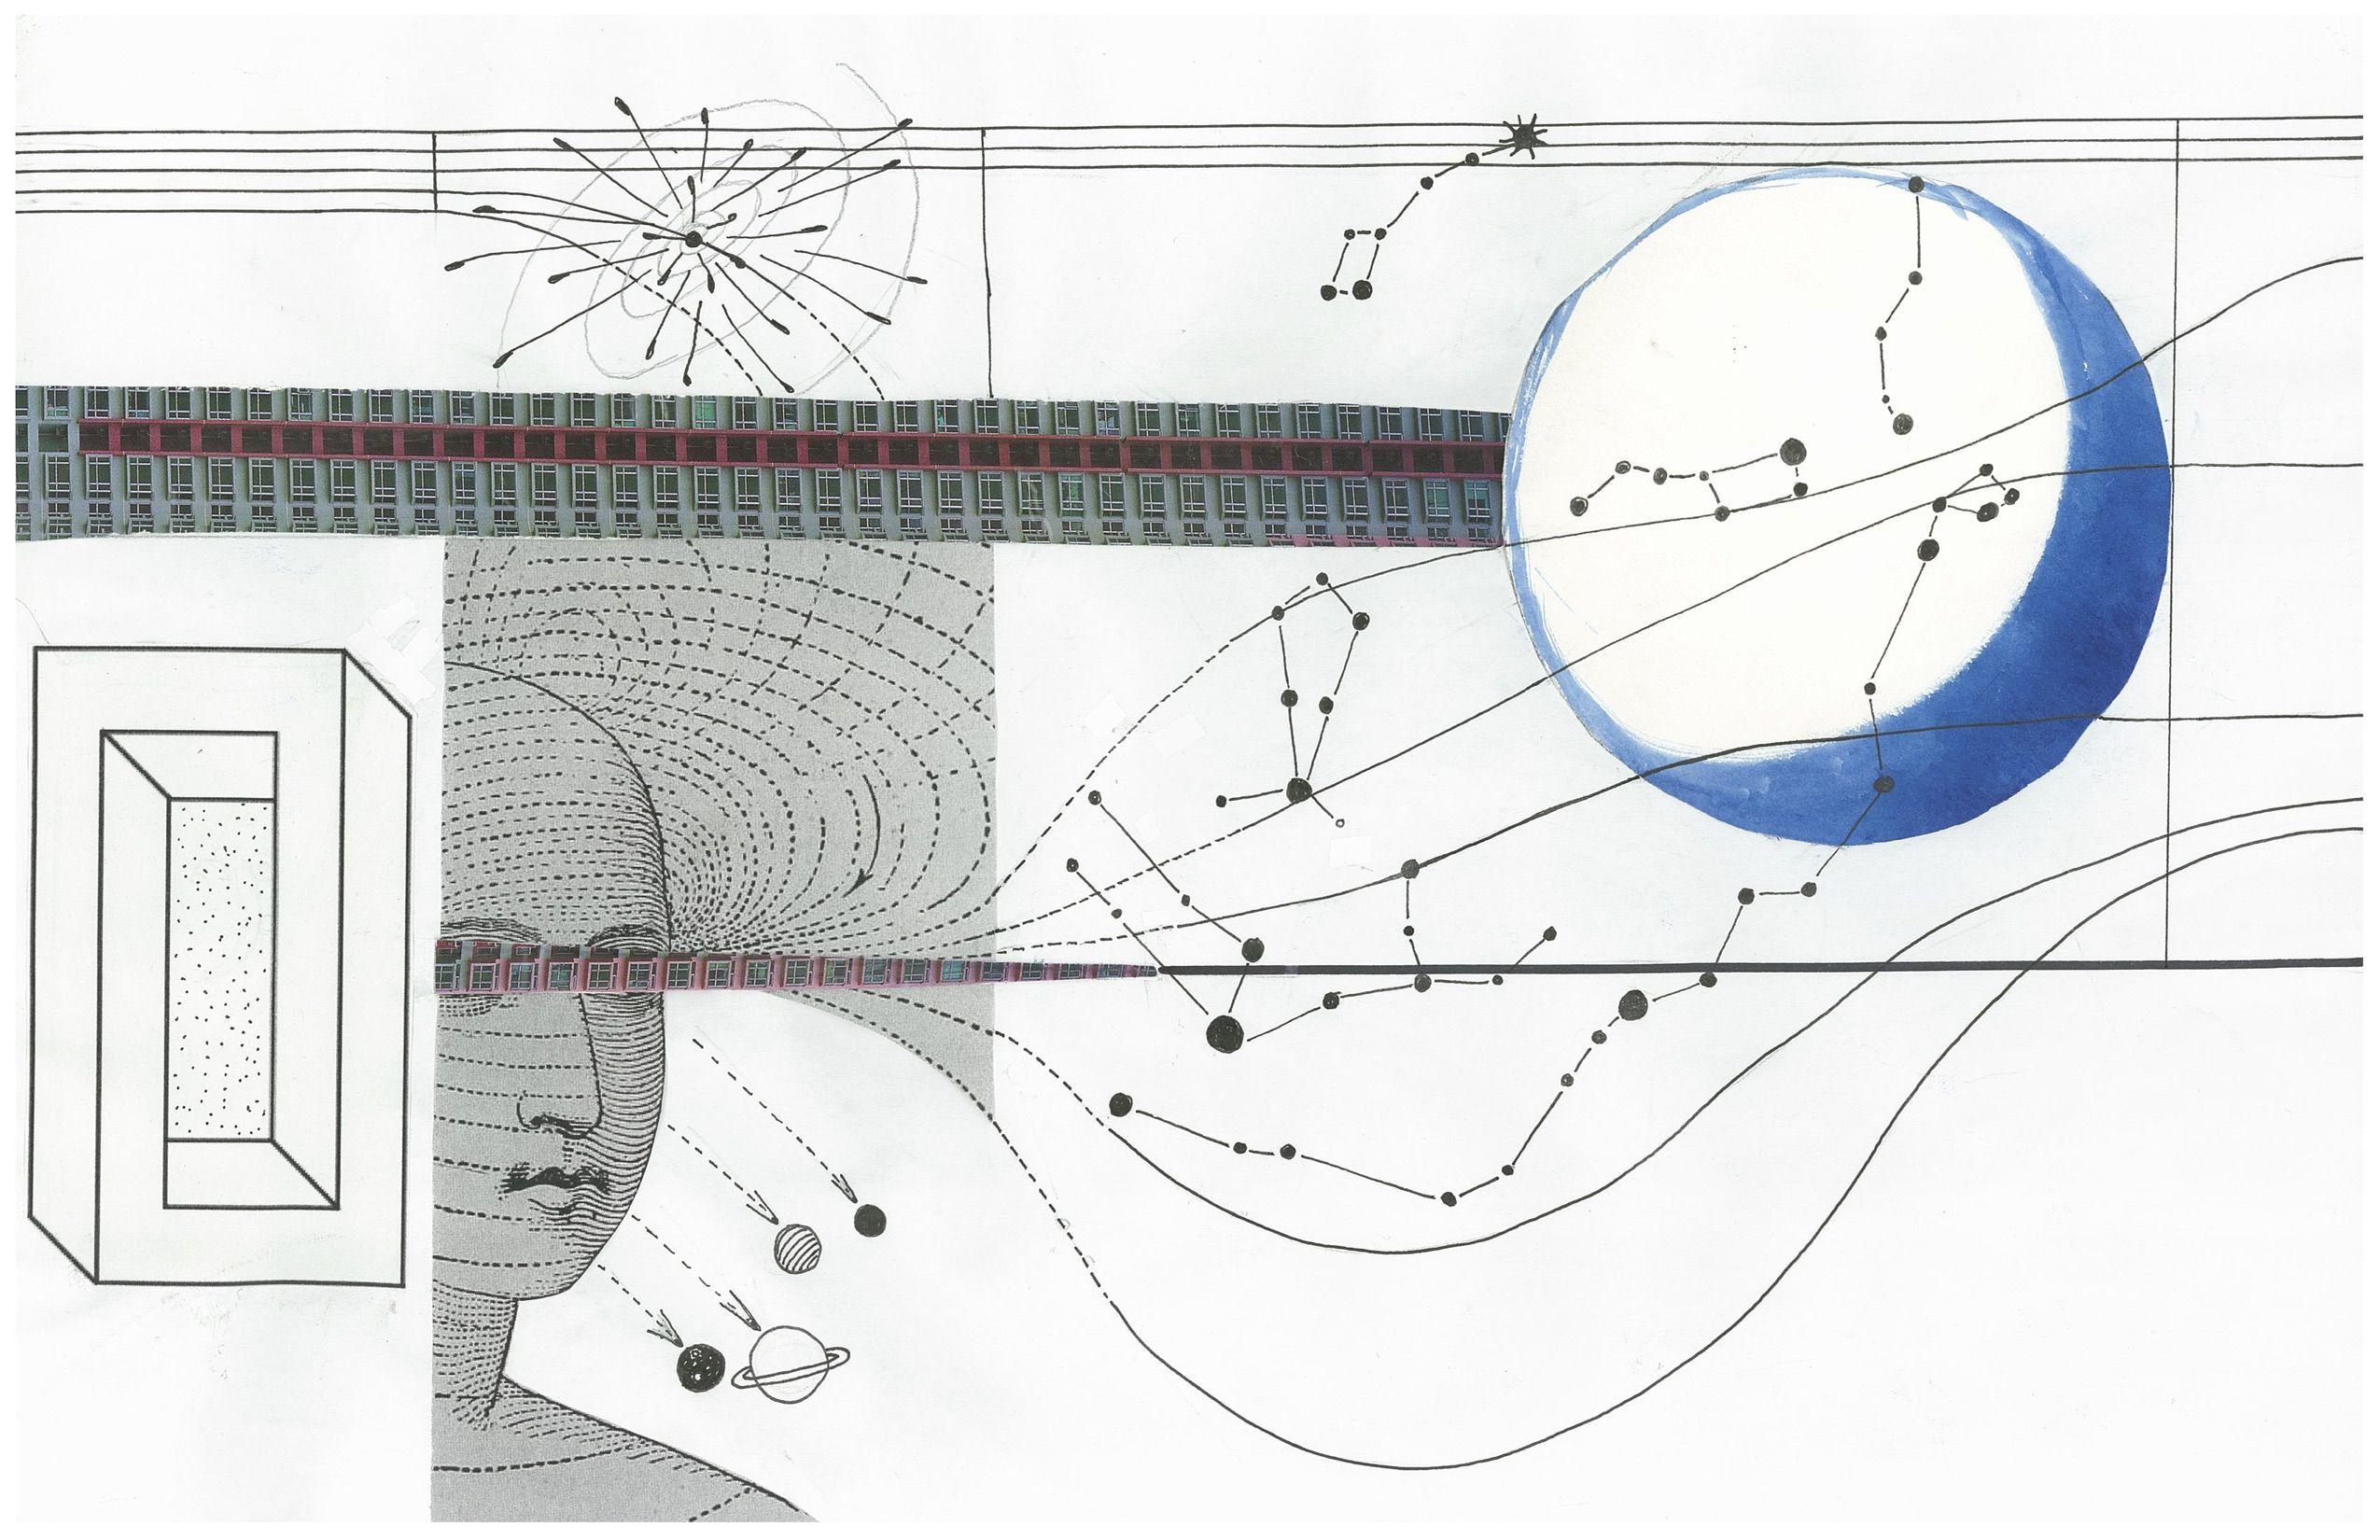 Infinite by Sarita Moodie  https://laboratorioartssociety.wordpress.com/2016/02/22/music-painting-one-page-score/